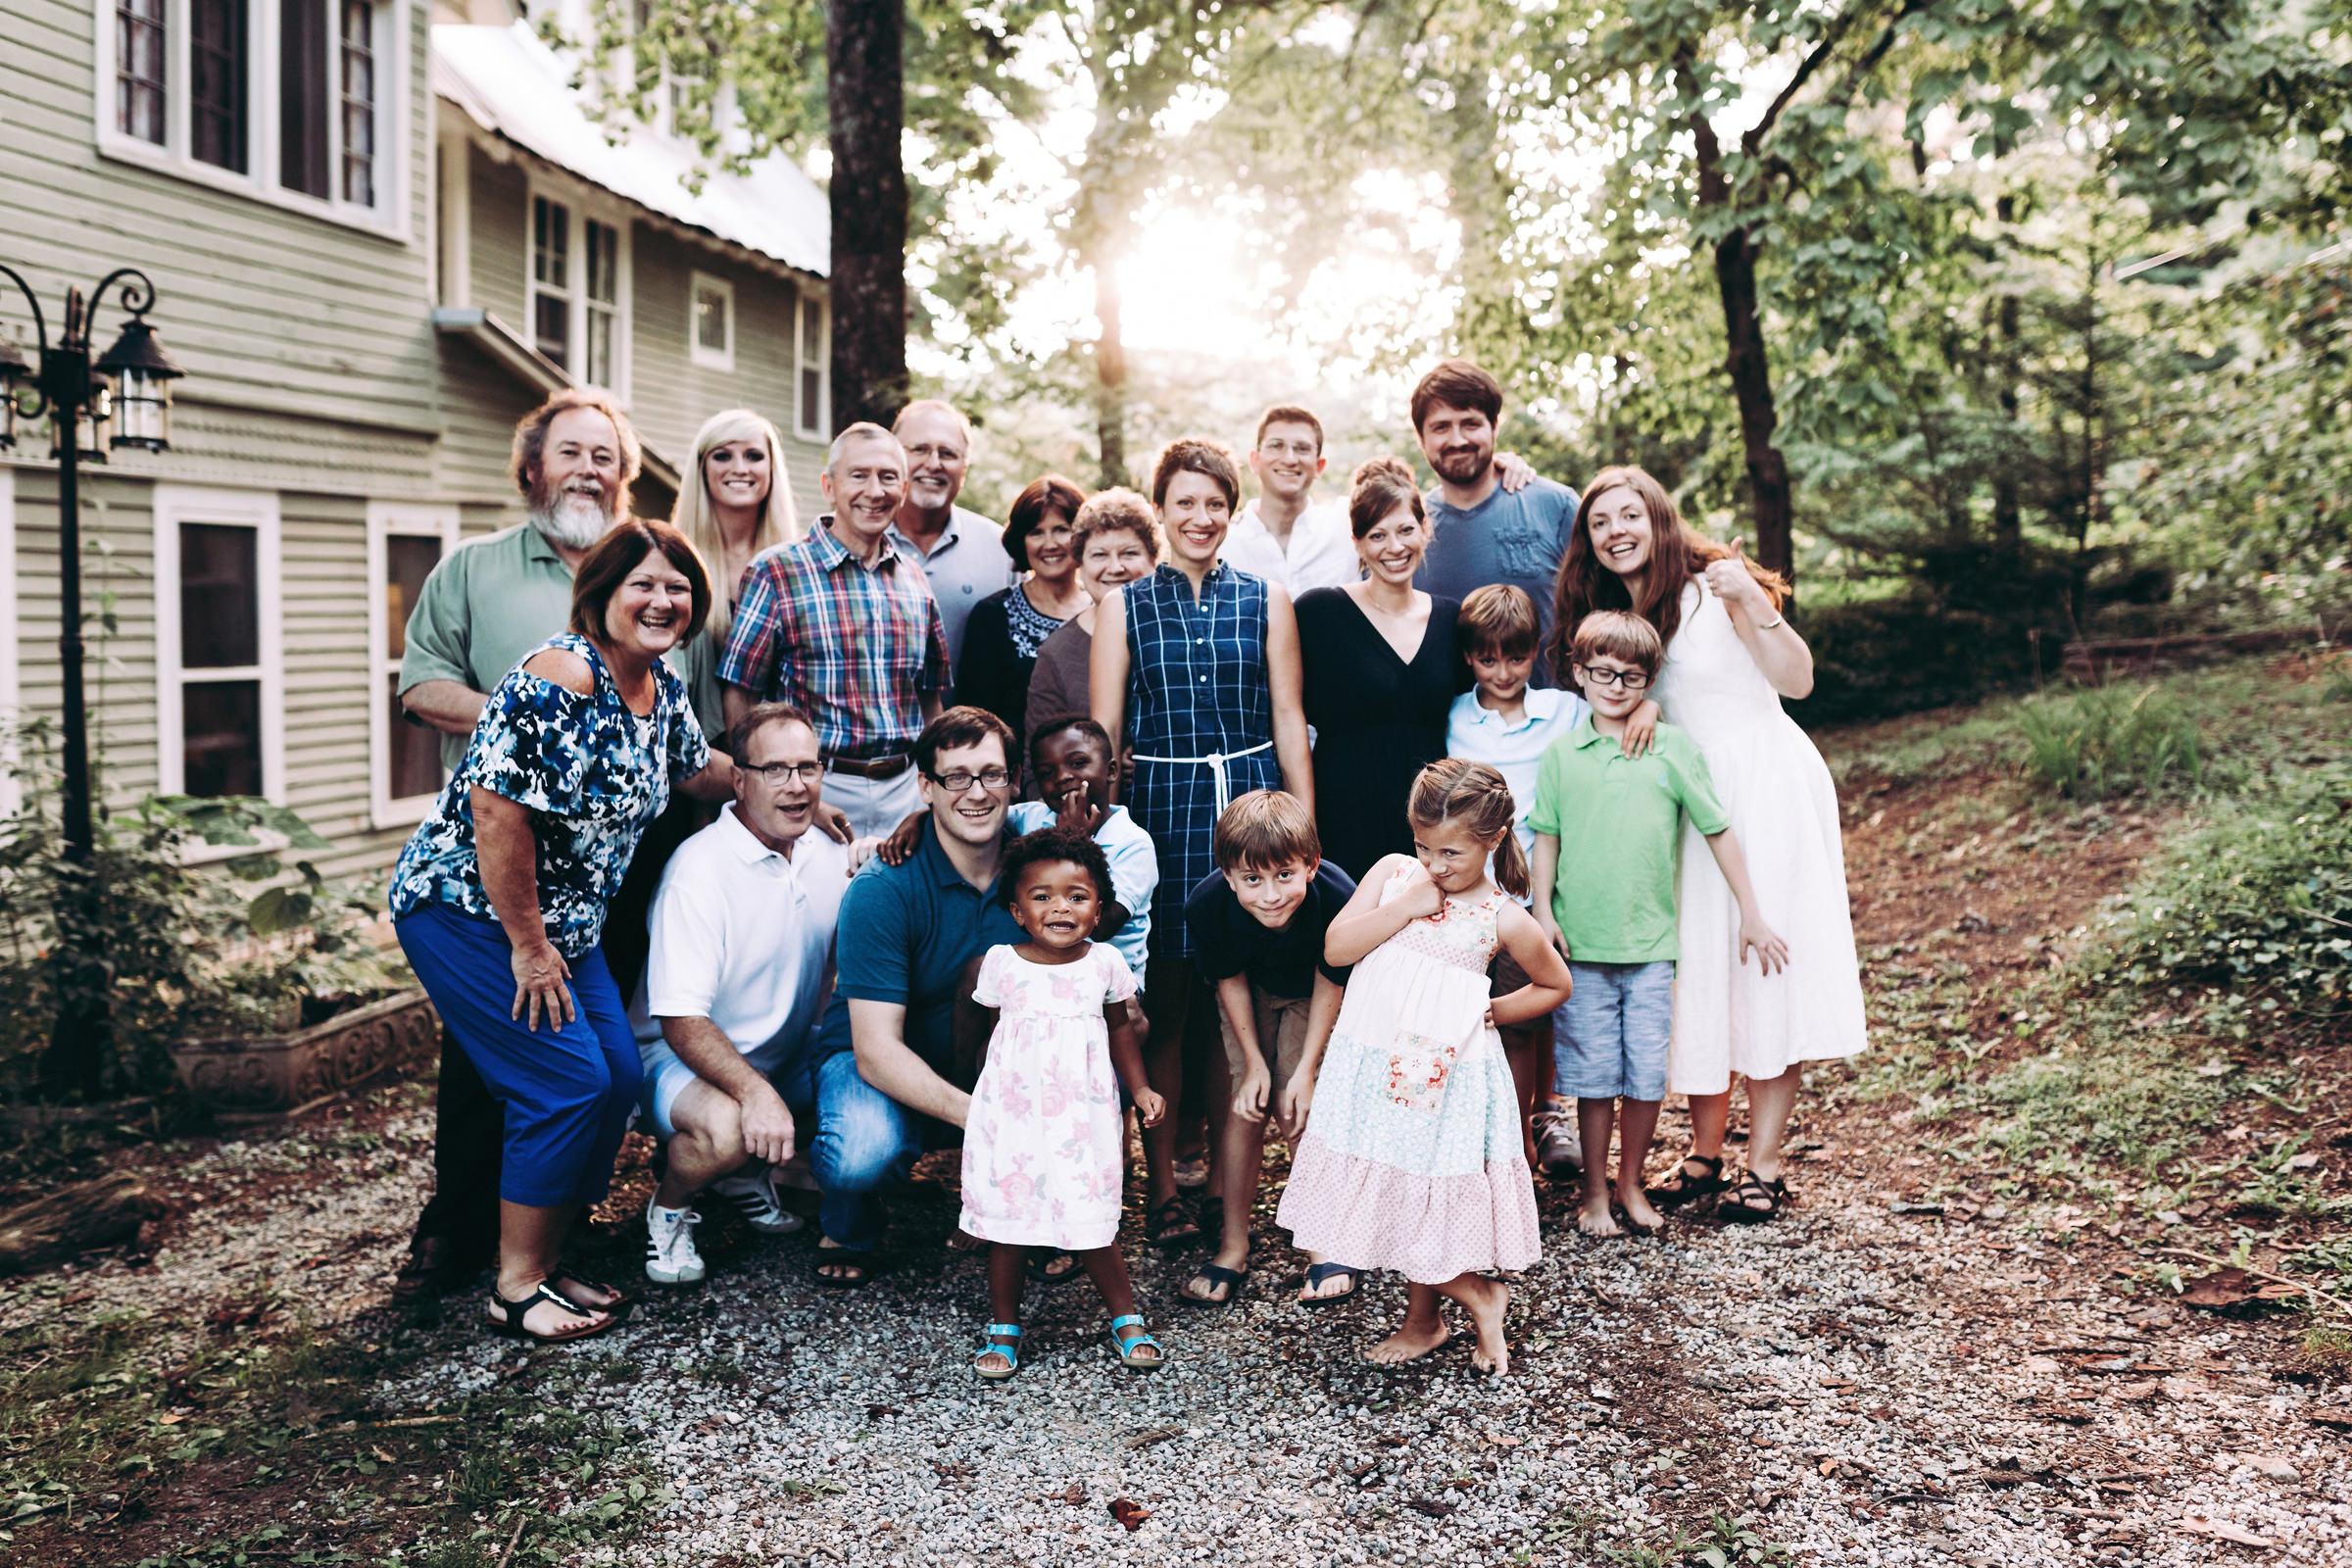 Kentucky_Candid_Wedding_Photographer_080.jpg